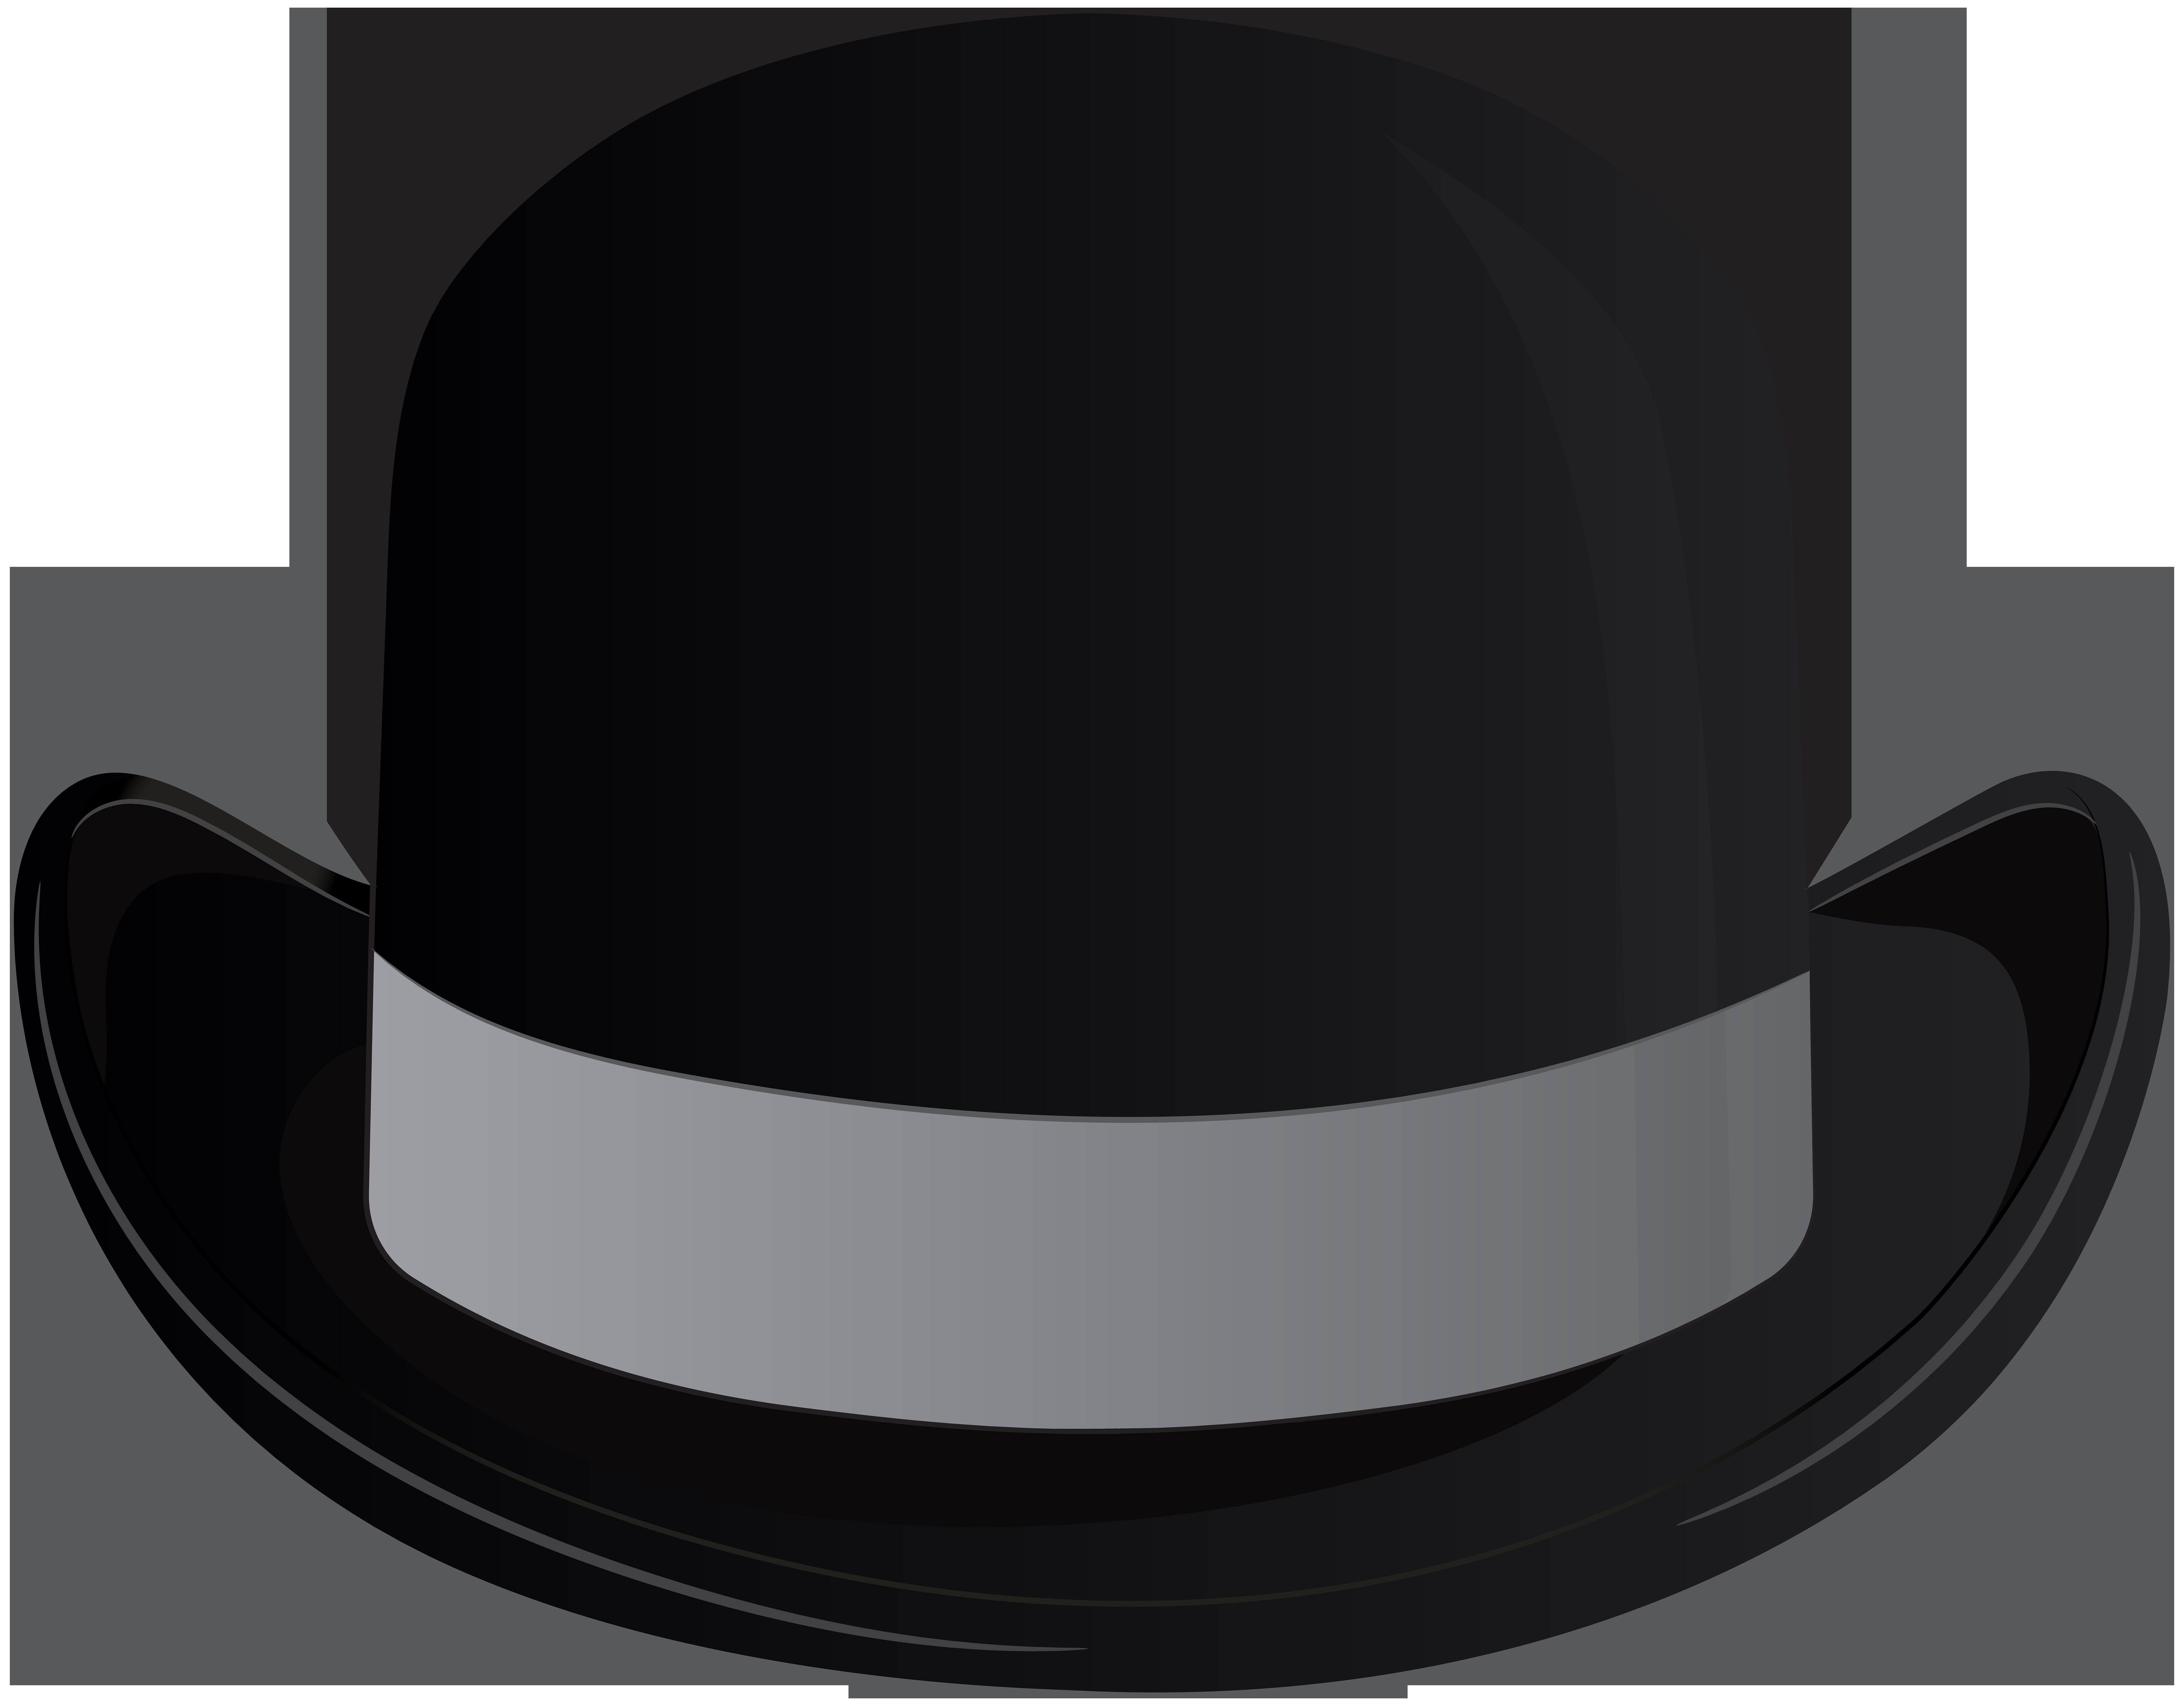 Fedora clipart bowler hat. Headgear clip art hats